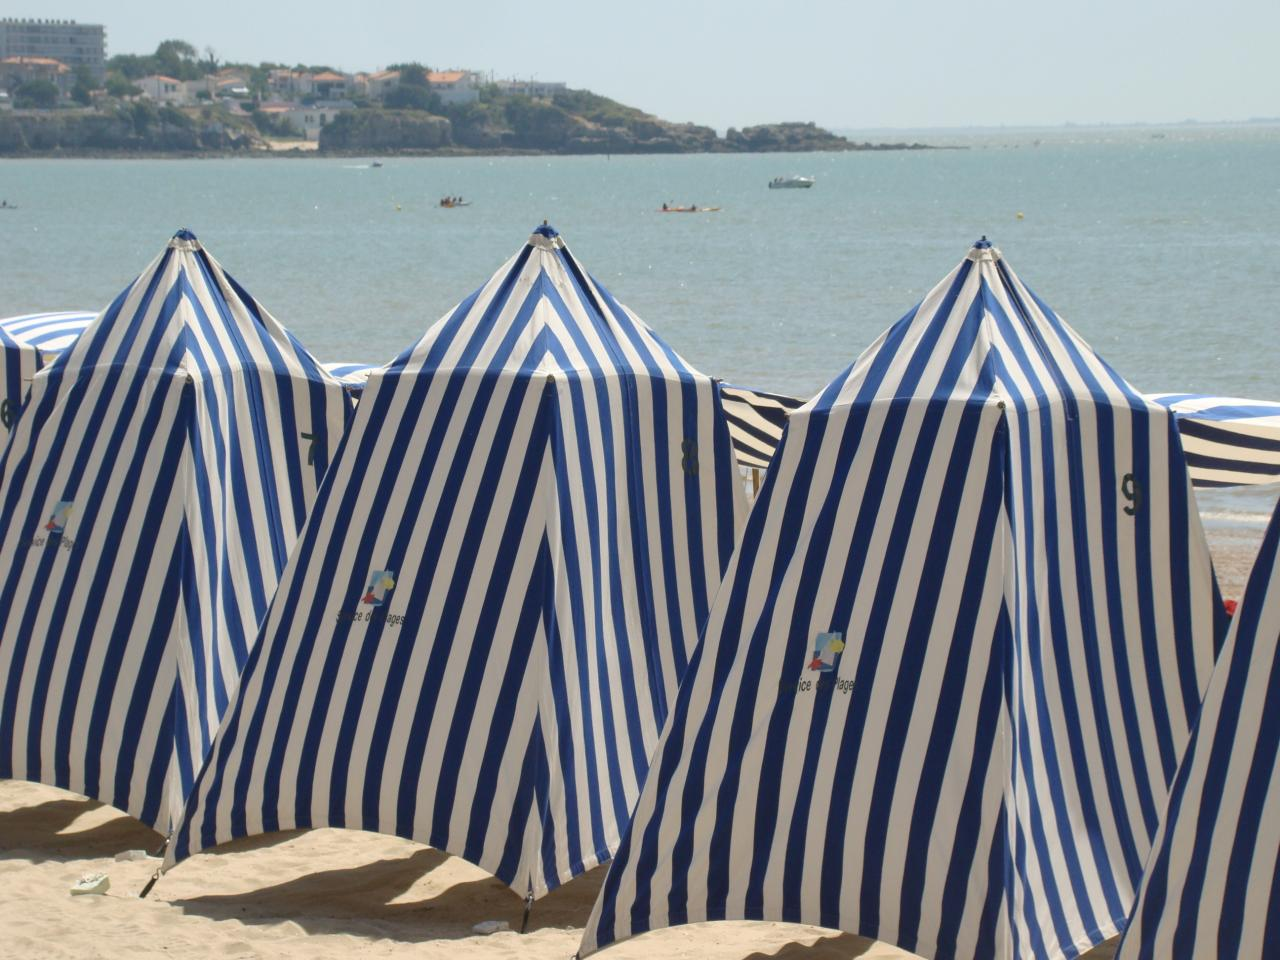 ROYAN - Tentes de plage © CMT17 E.COEFFE-2